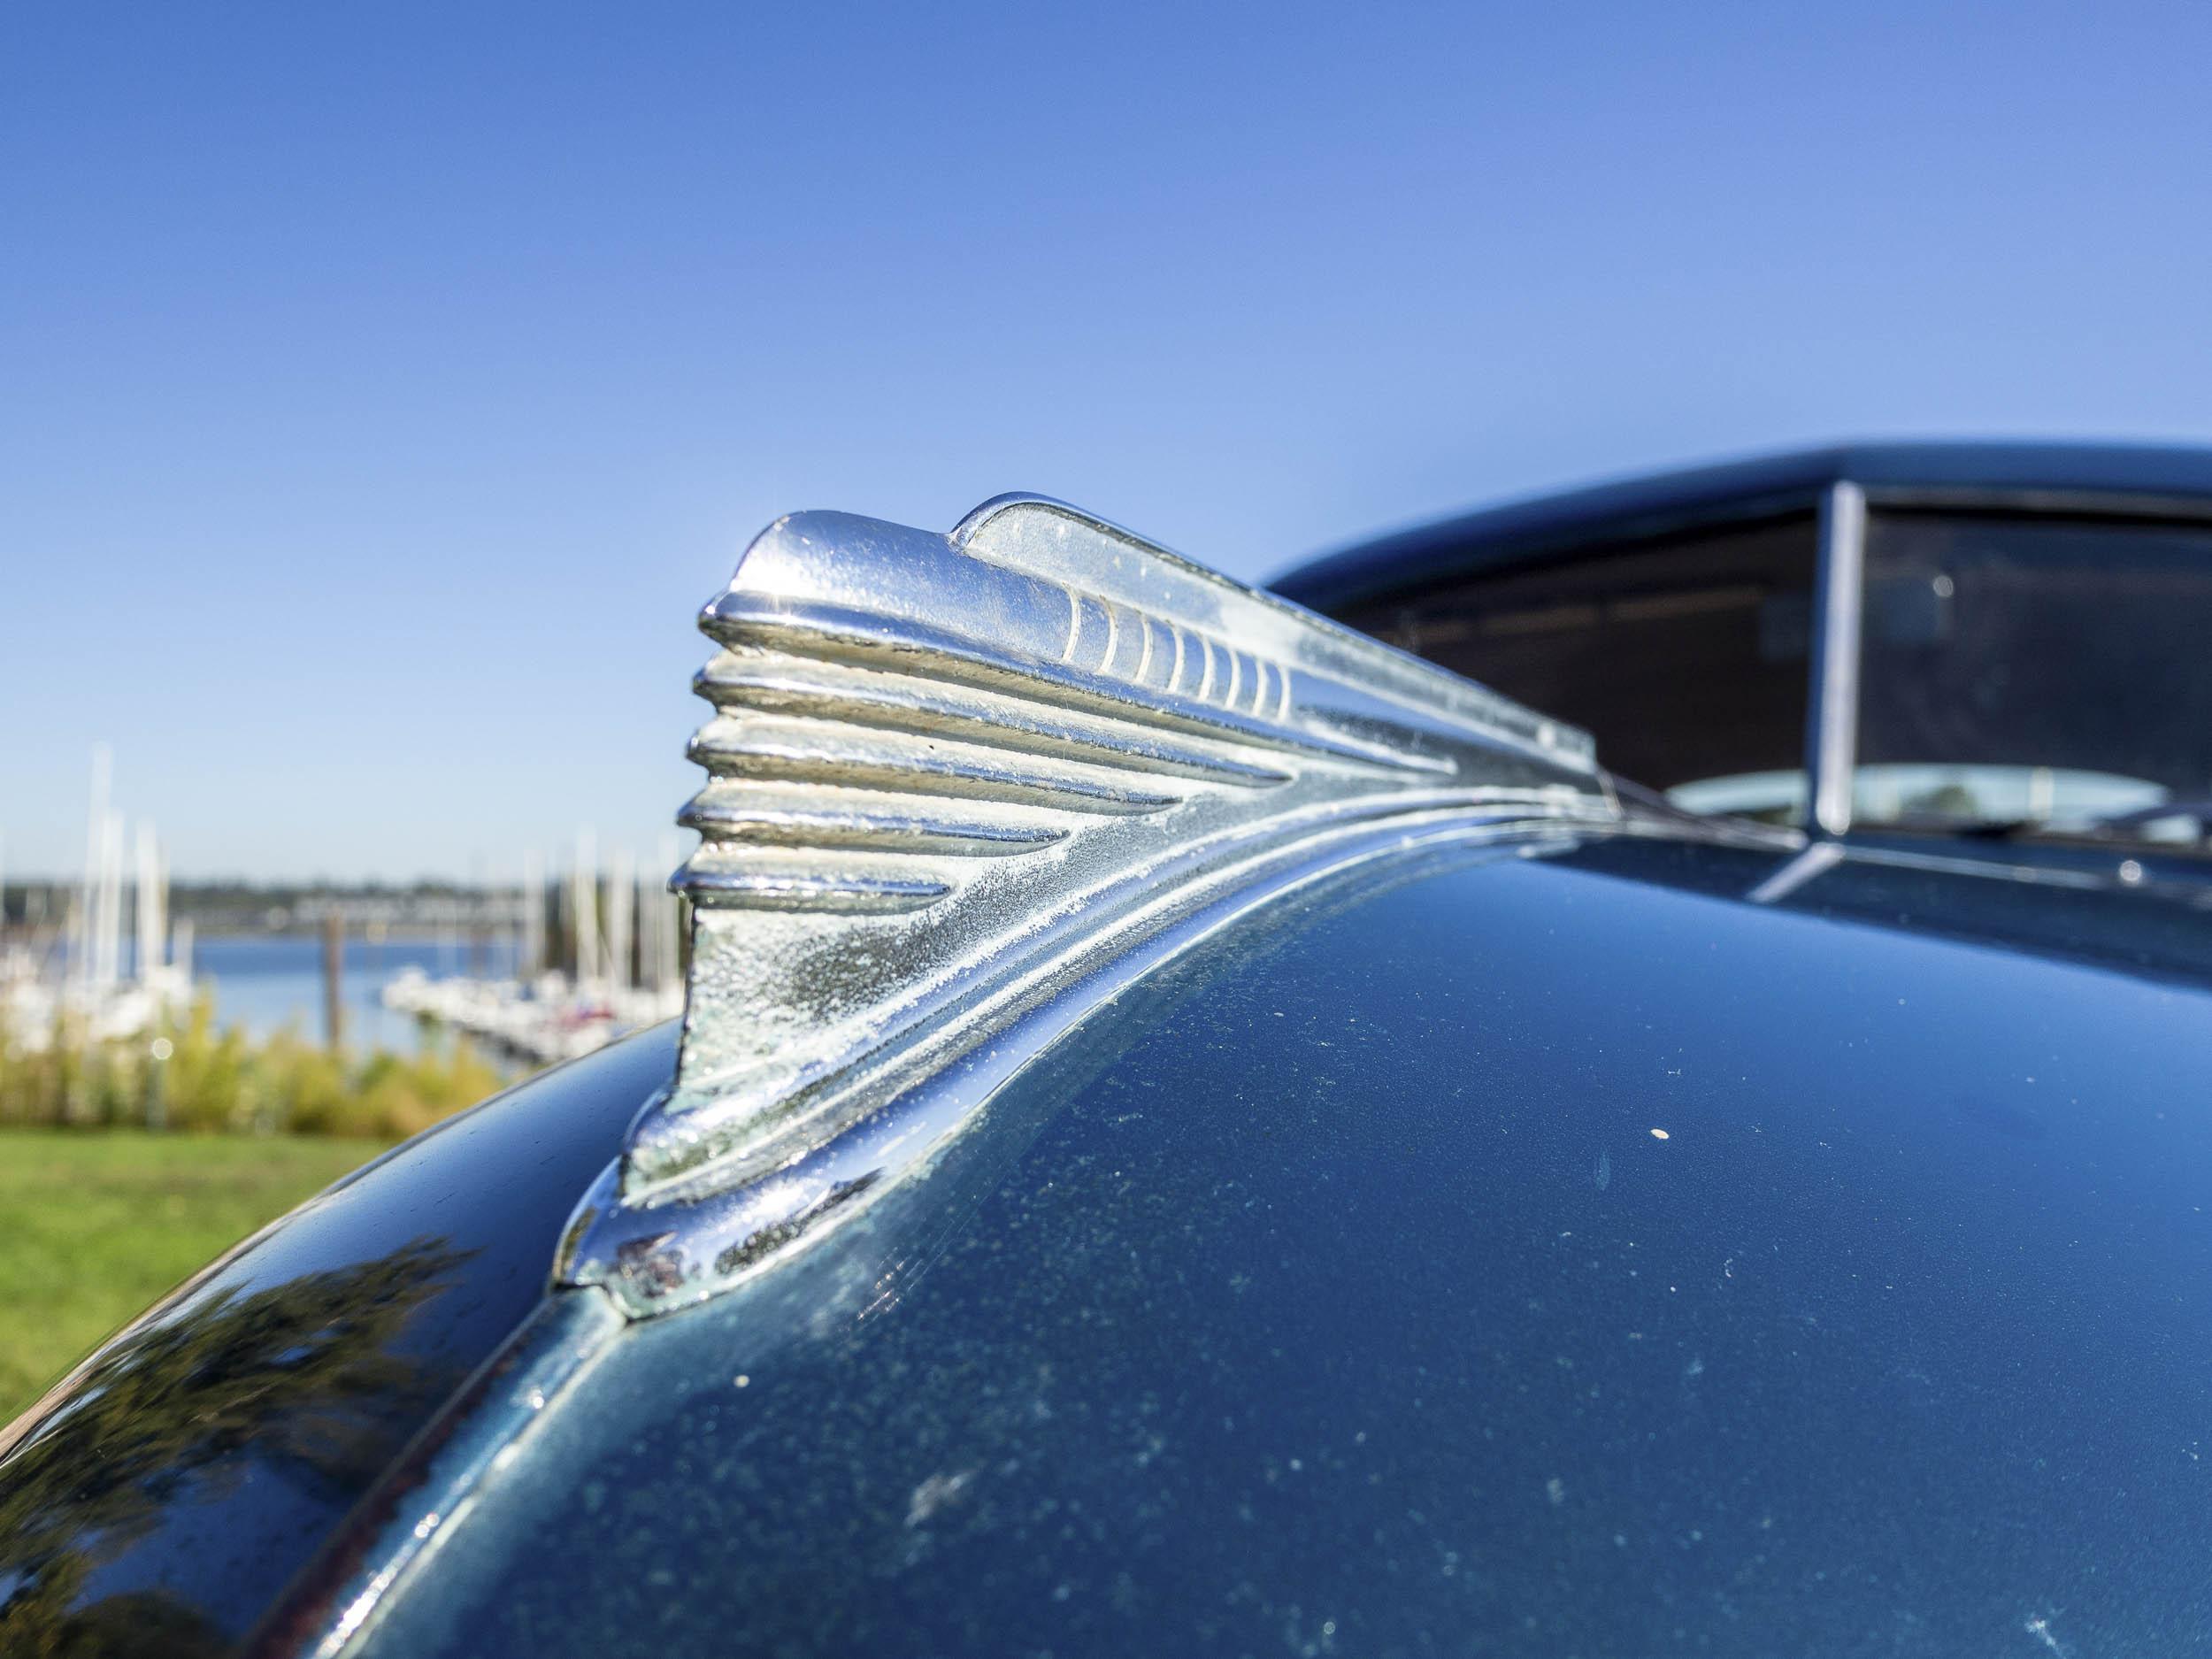 1941 Chevrolet Master Deluxe hood ornament